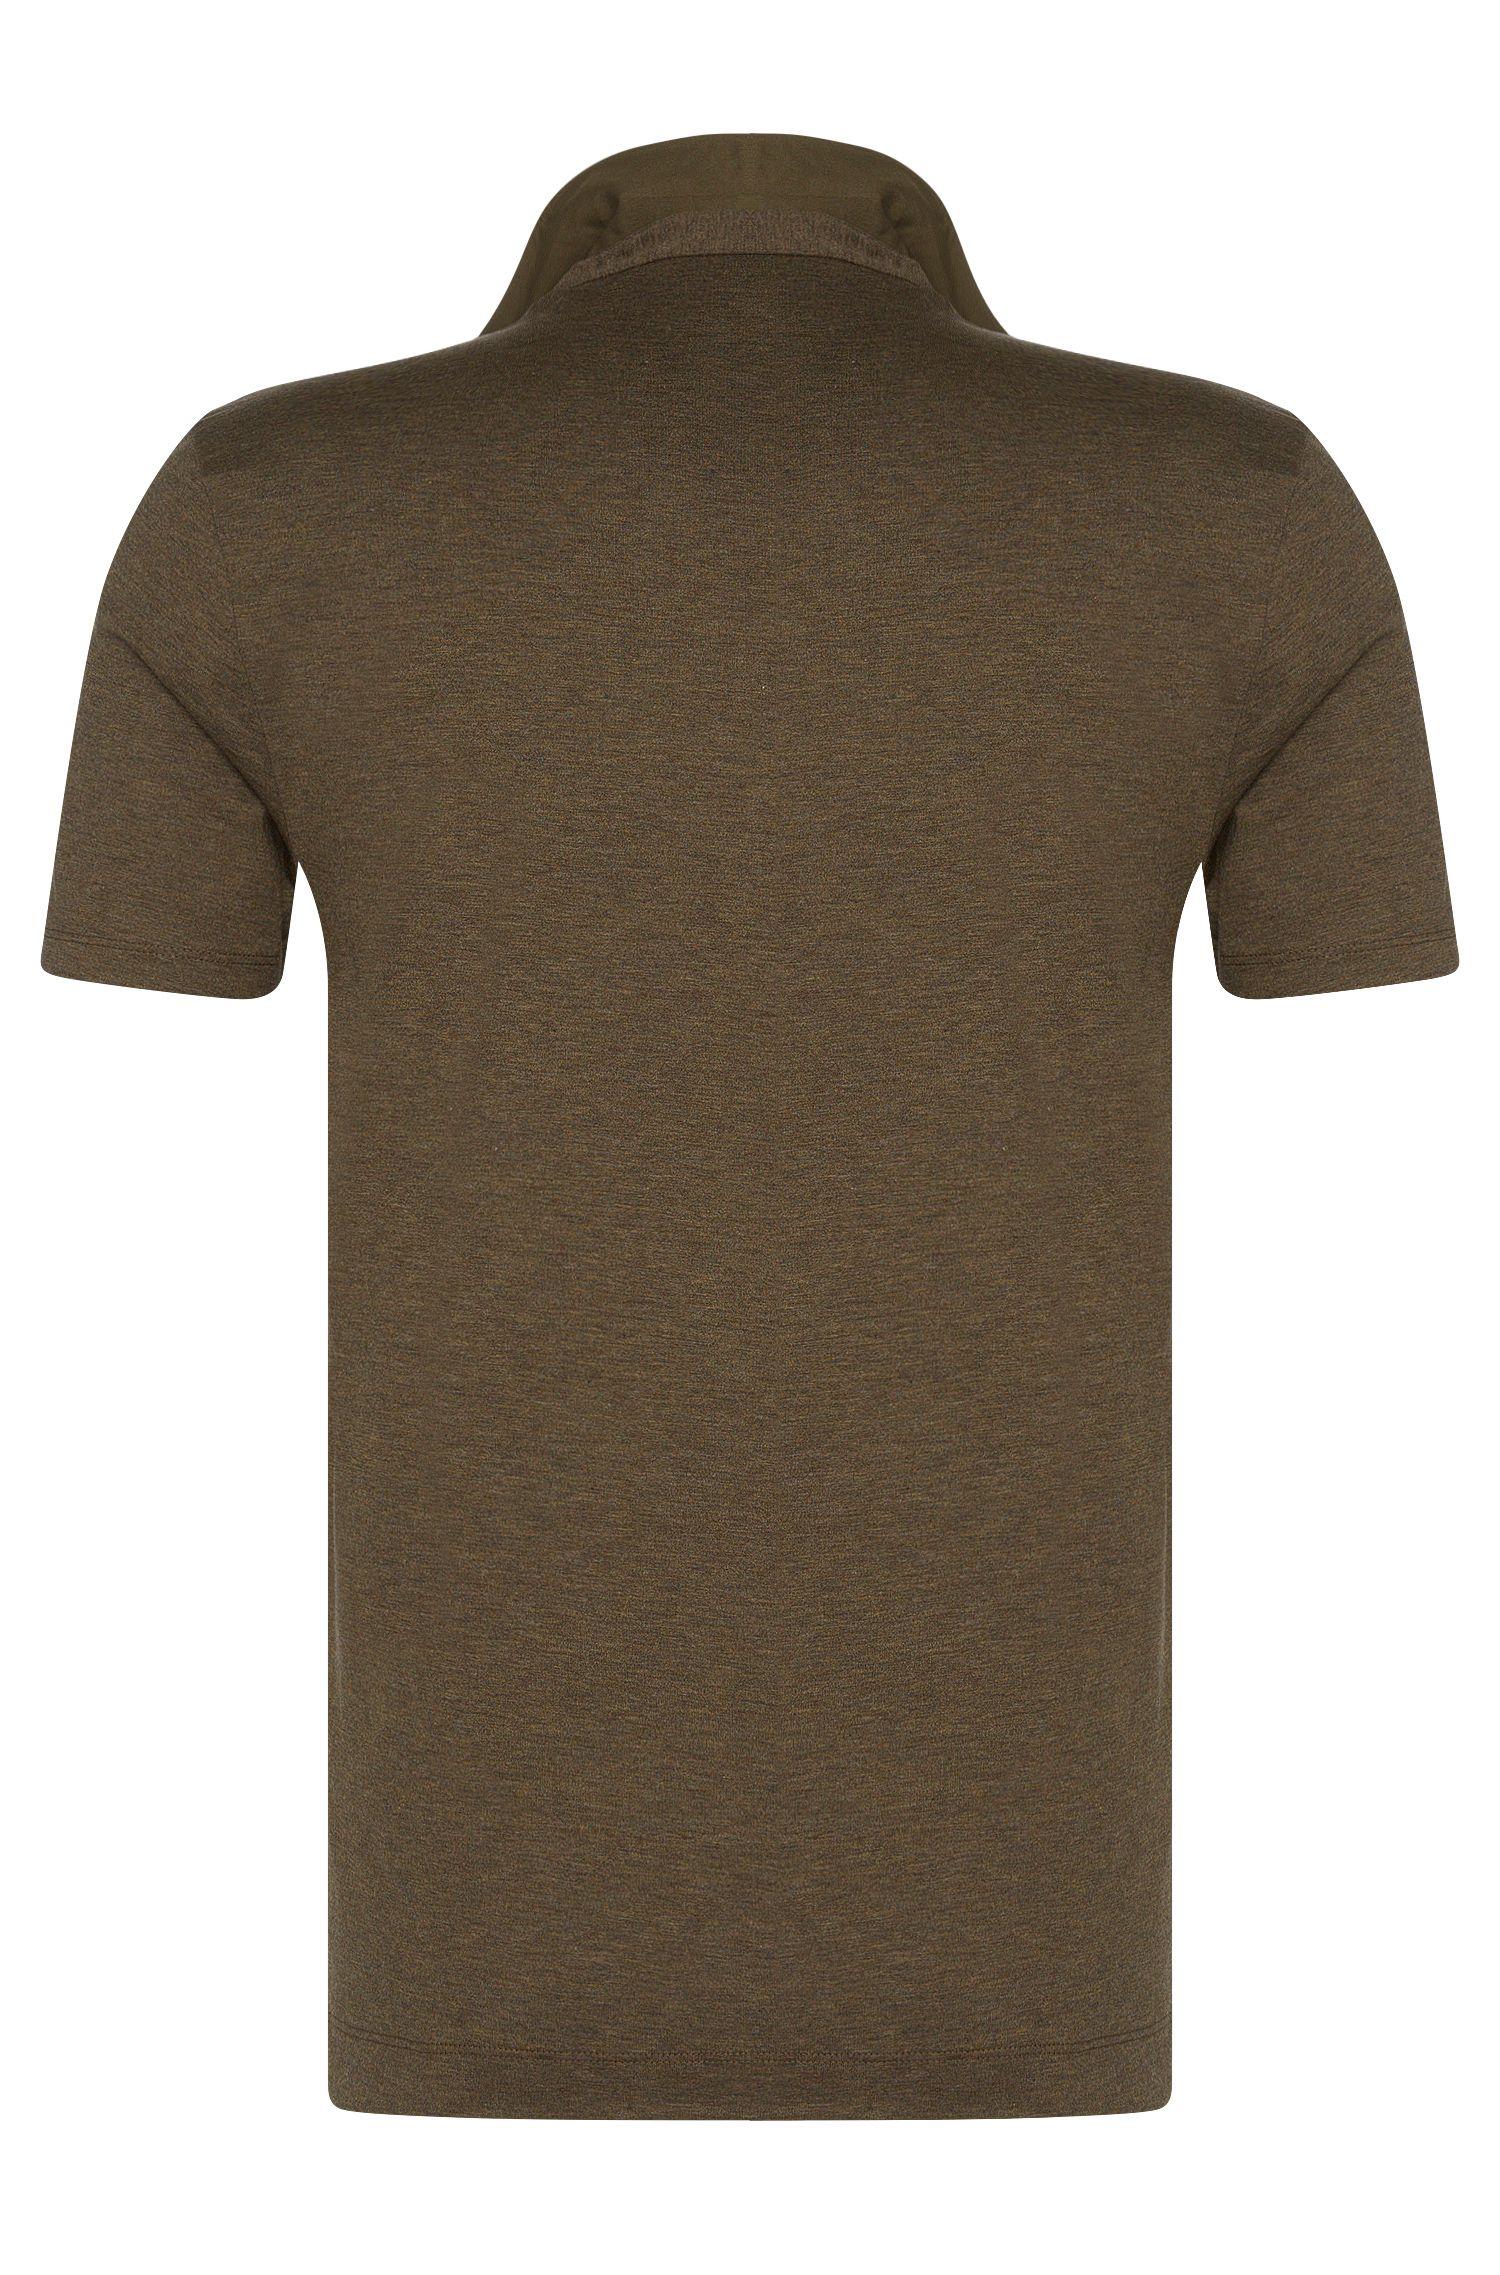 Meliertes Slim-Fit Poloshirt aus Baumwoll-Mix mit Seide: 'Platt 02'